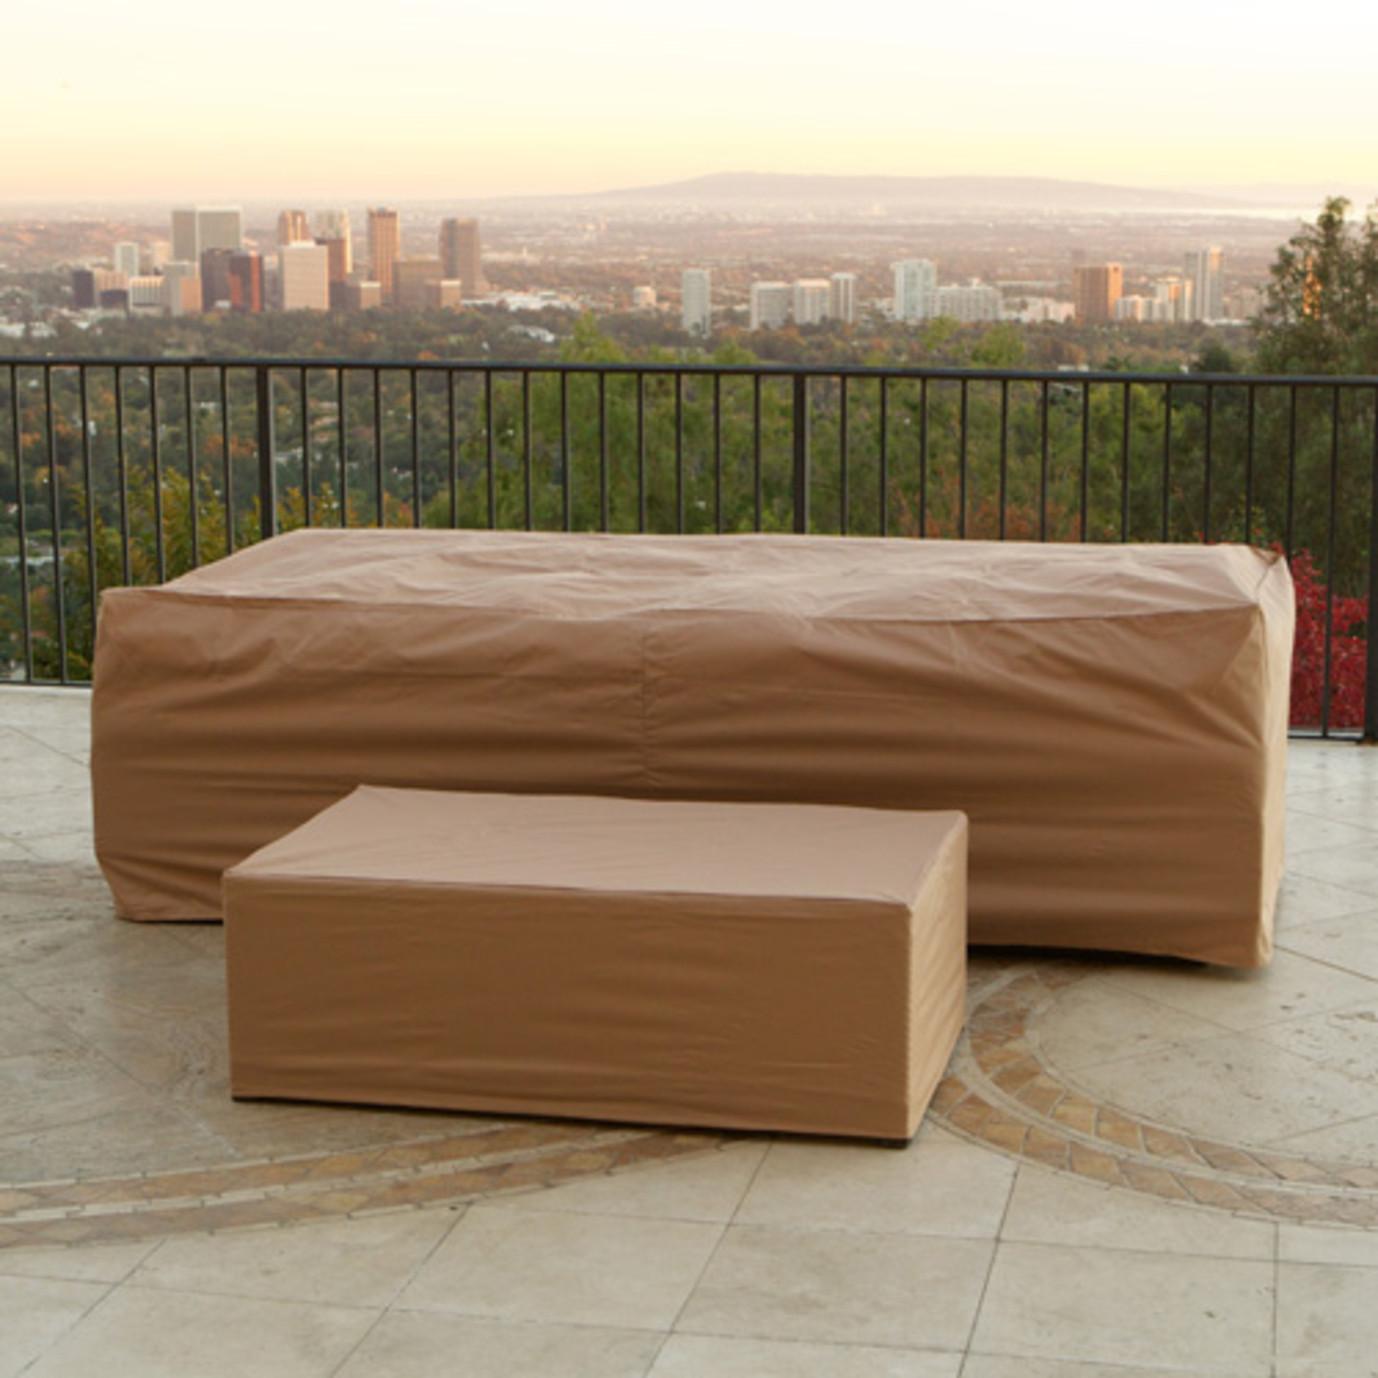 "Portofino Furniture Covers for 96"" Sofa & Coffee Table"